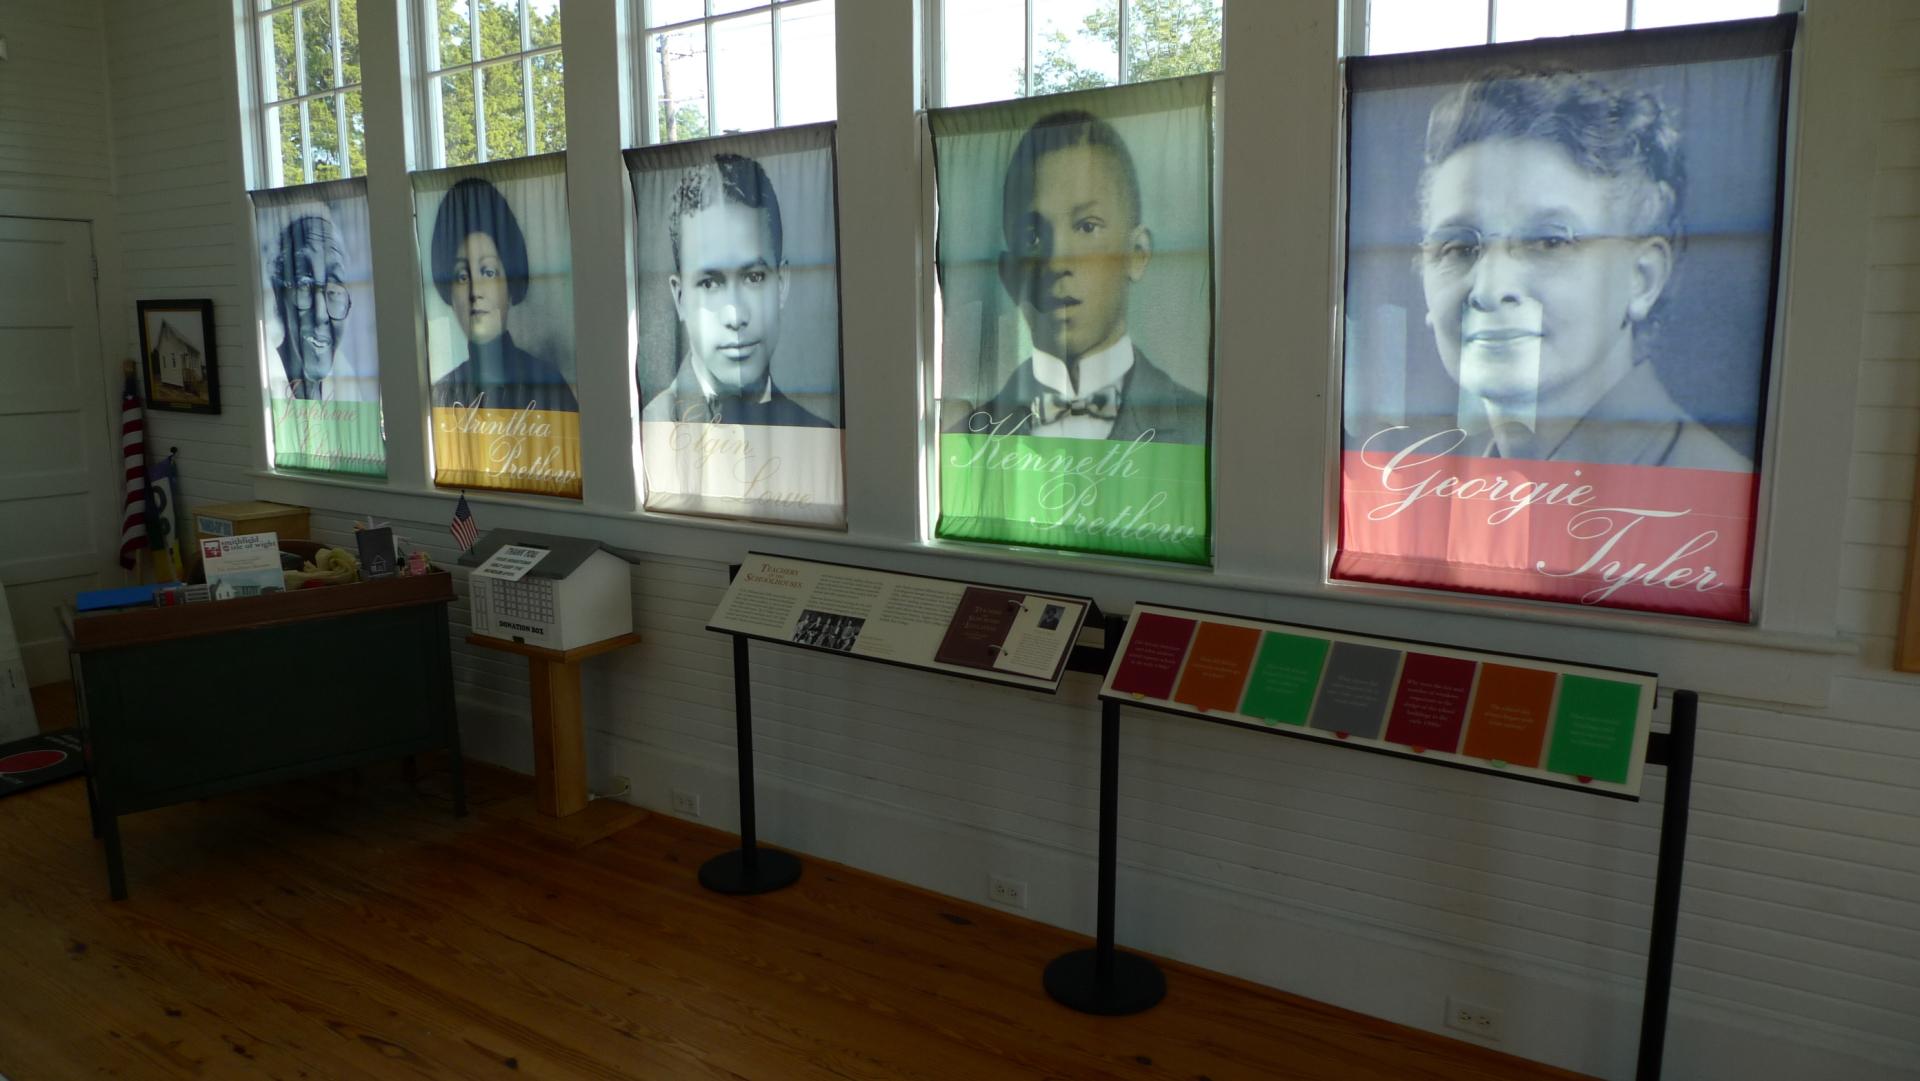 The Schoolhouse Museum